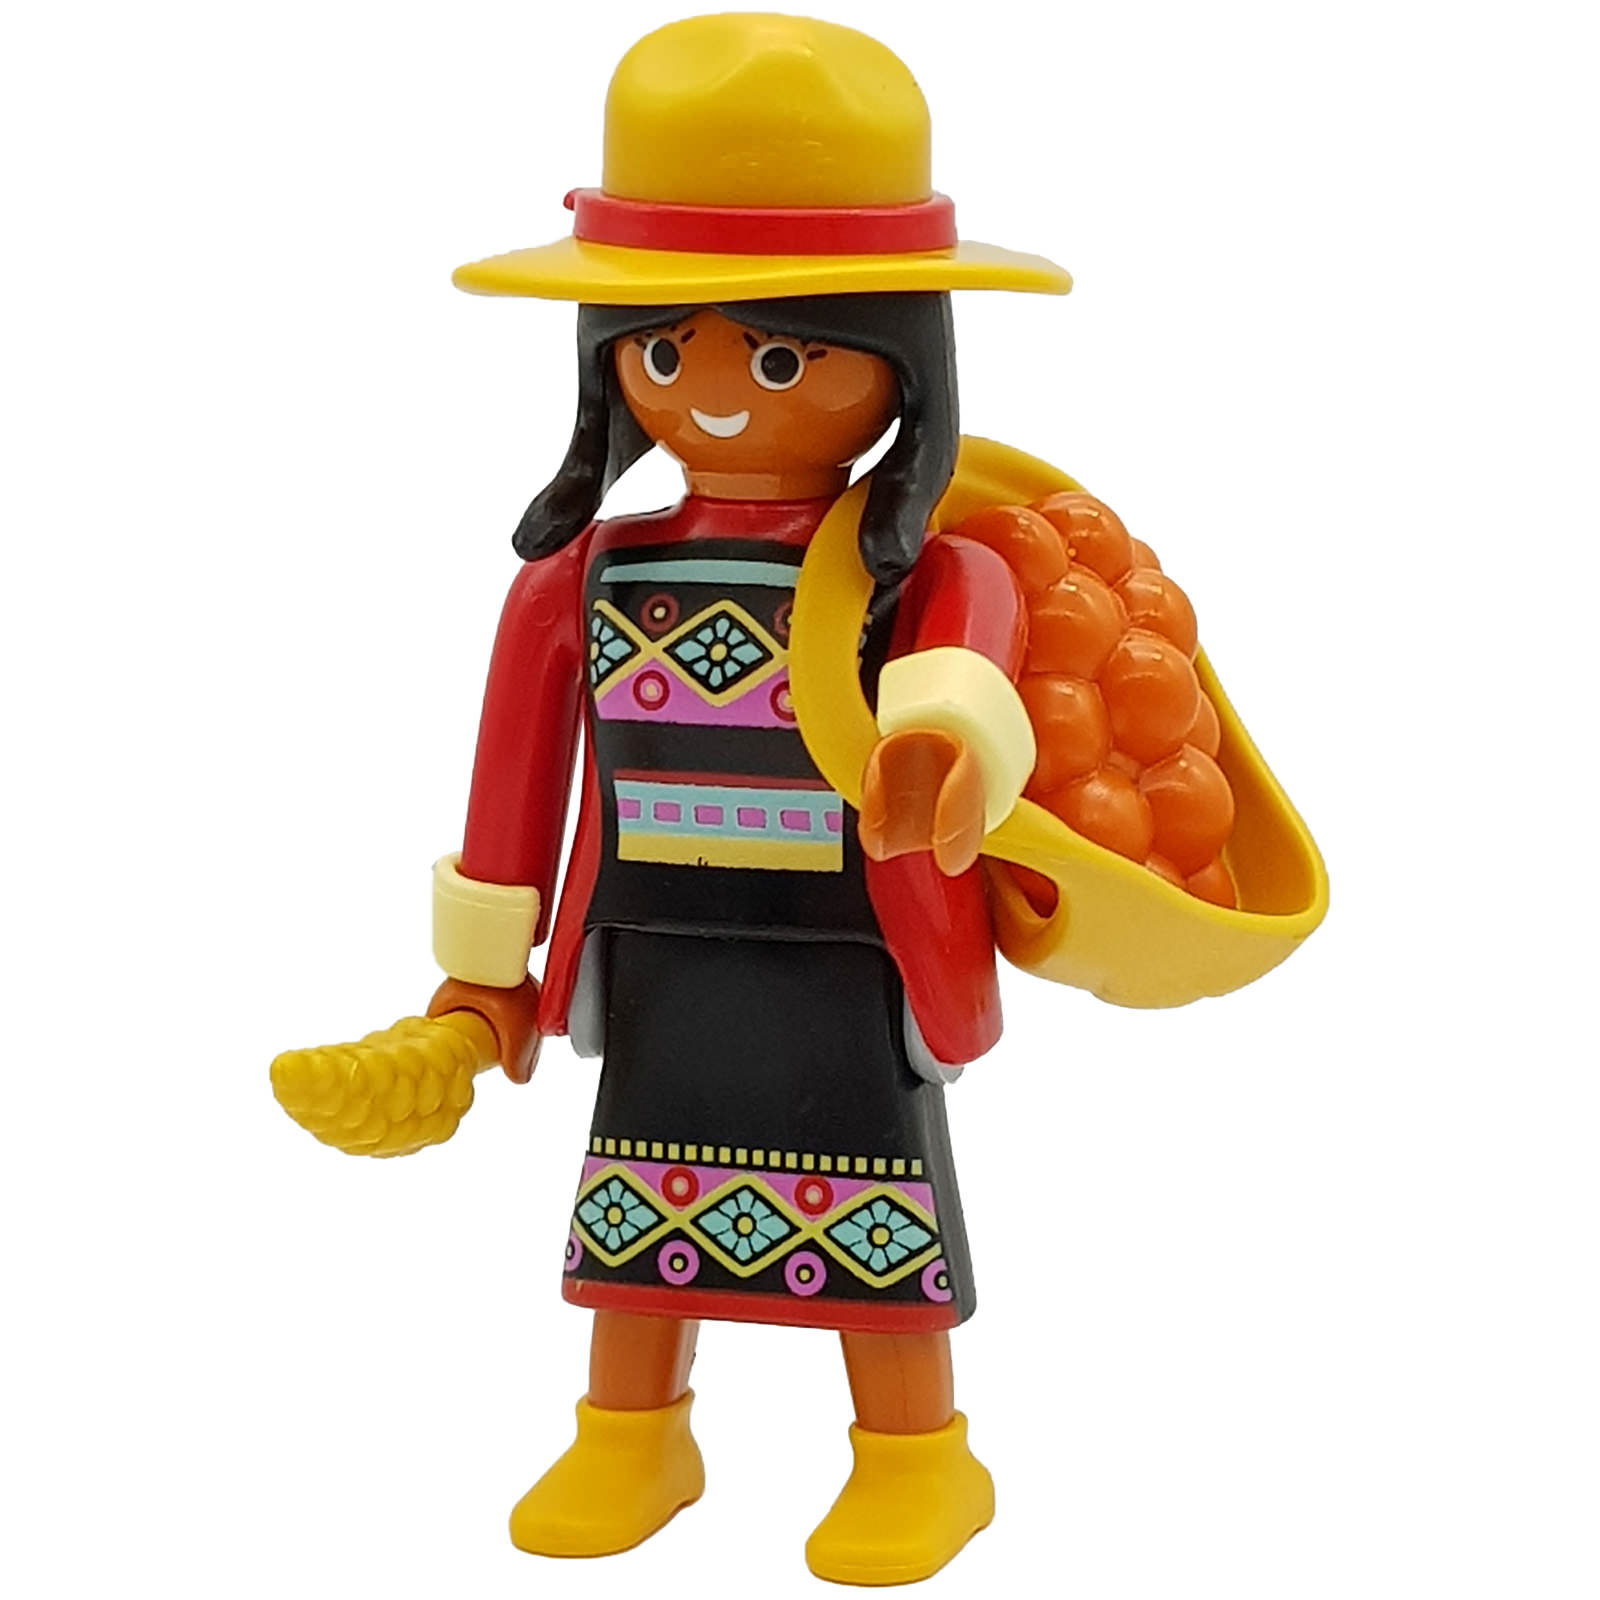 playmobil® figures serie 11 - neu & gebraucht kaufen